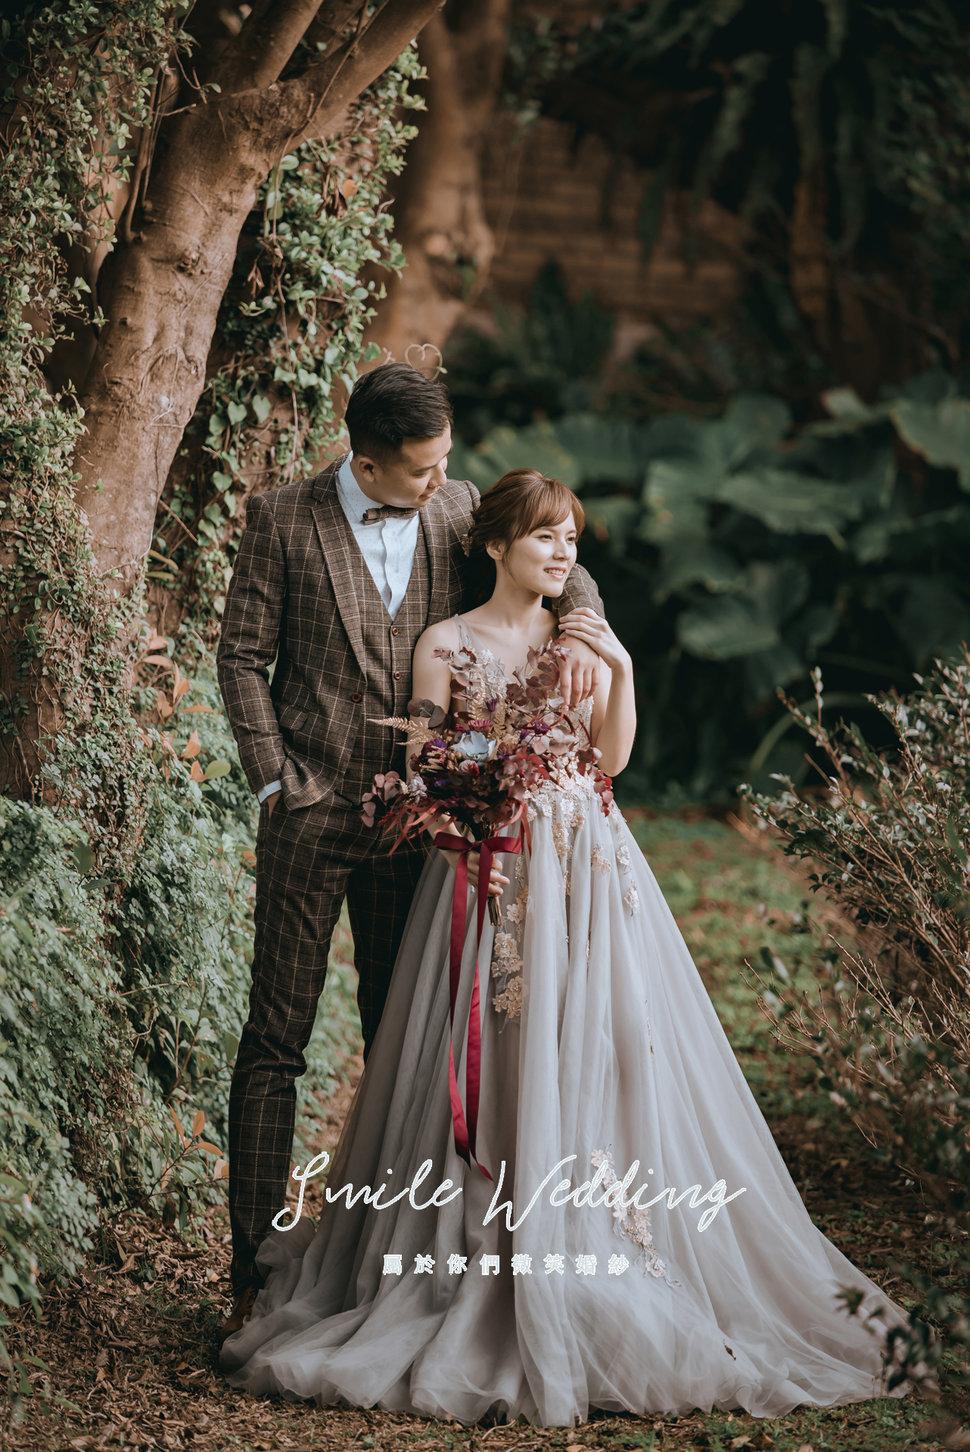 WEI_3193 - Smile wedding 微笑婚紗《結婚吧》